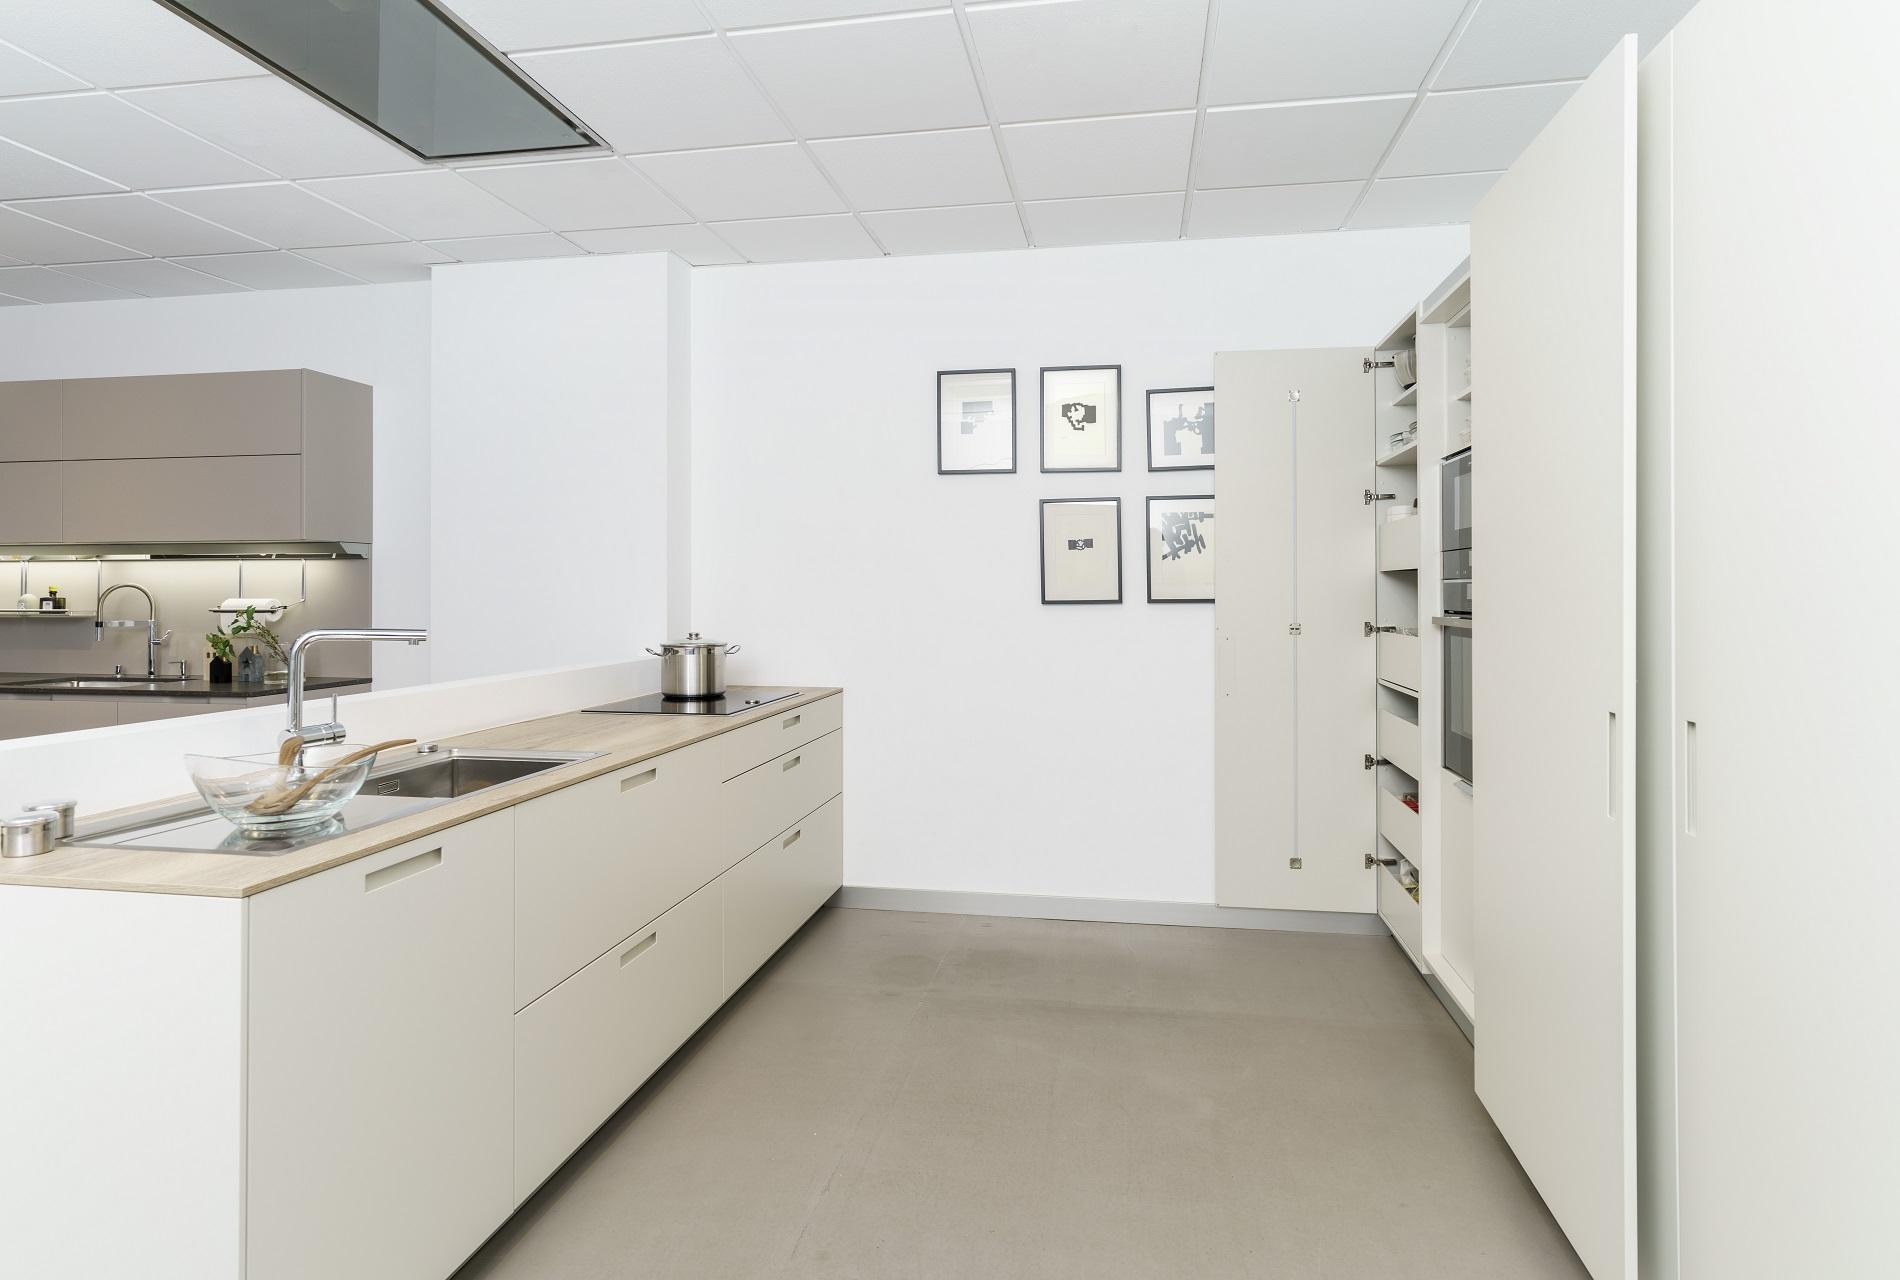 Cocinas de exposición en liquidación Karmel Santos